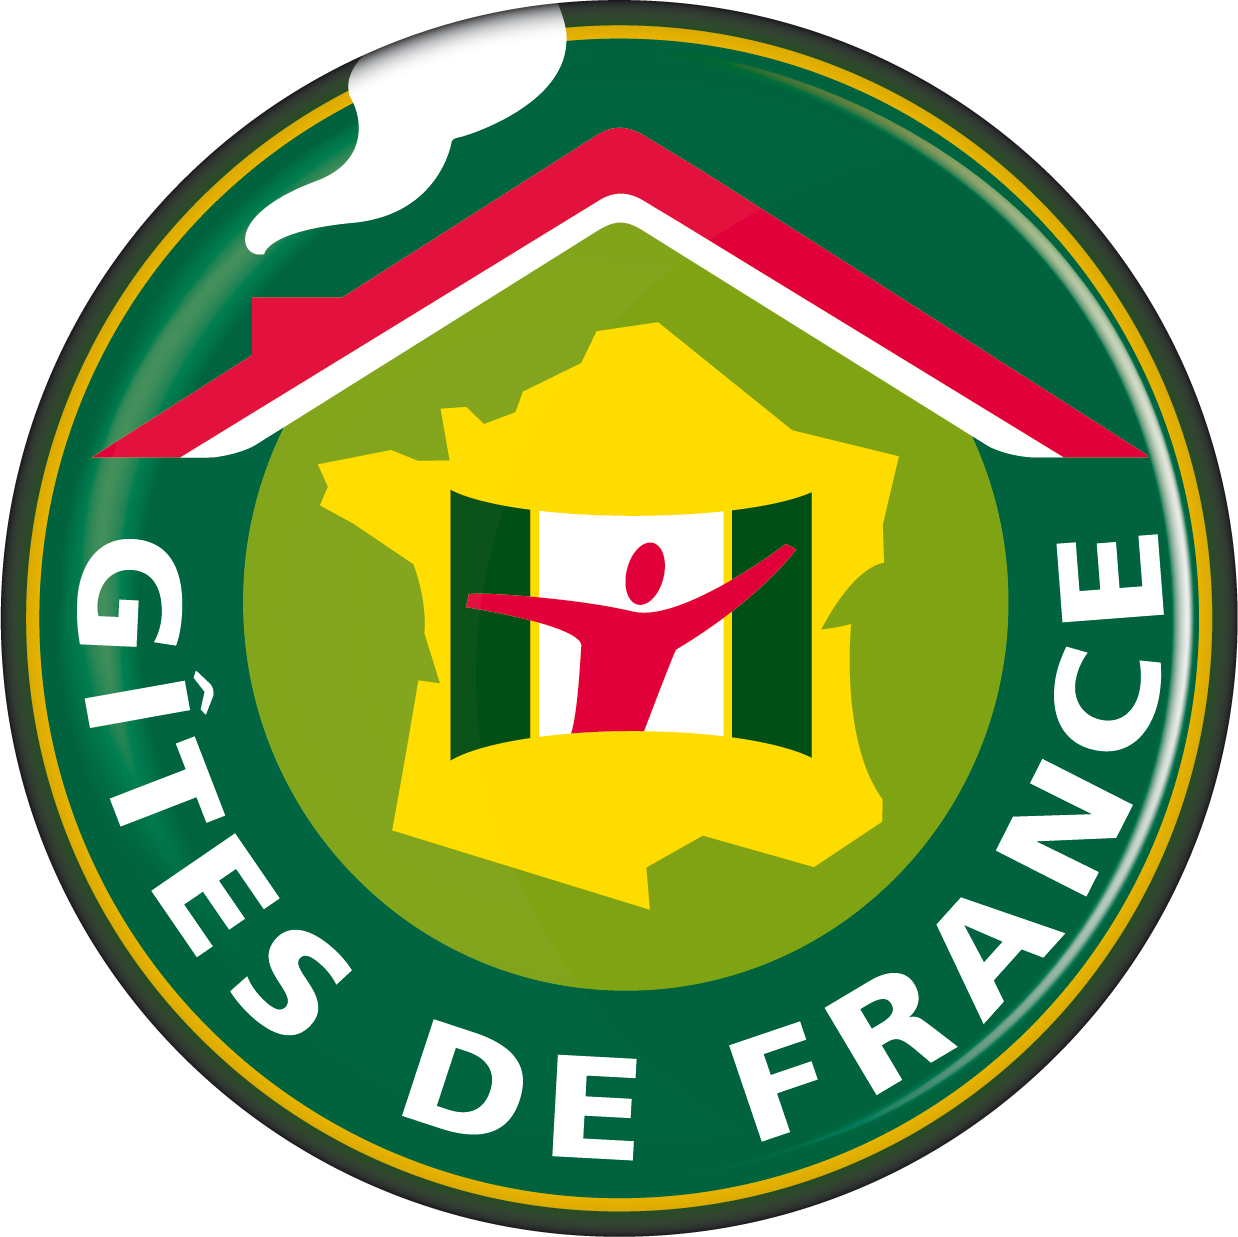 13 Gîtes_de_France_logo